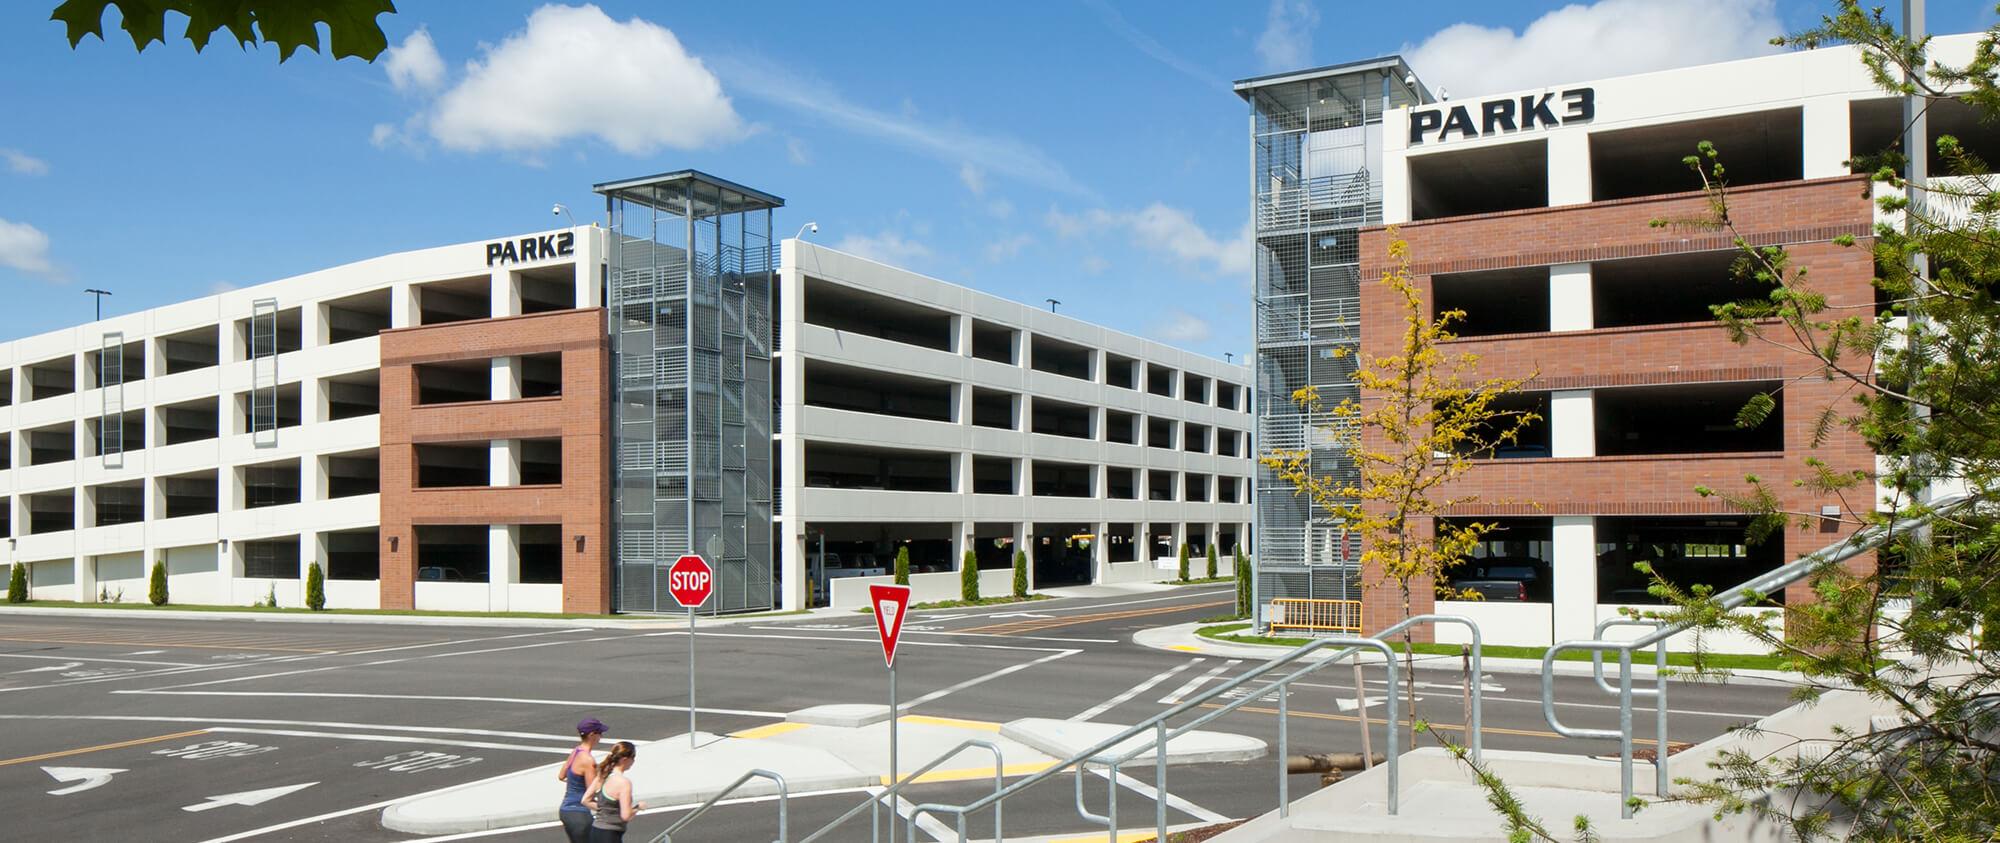 Parking Garages Confidential Client General Contractor